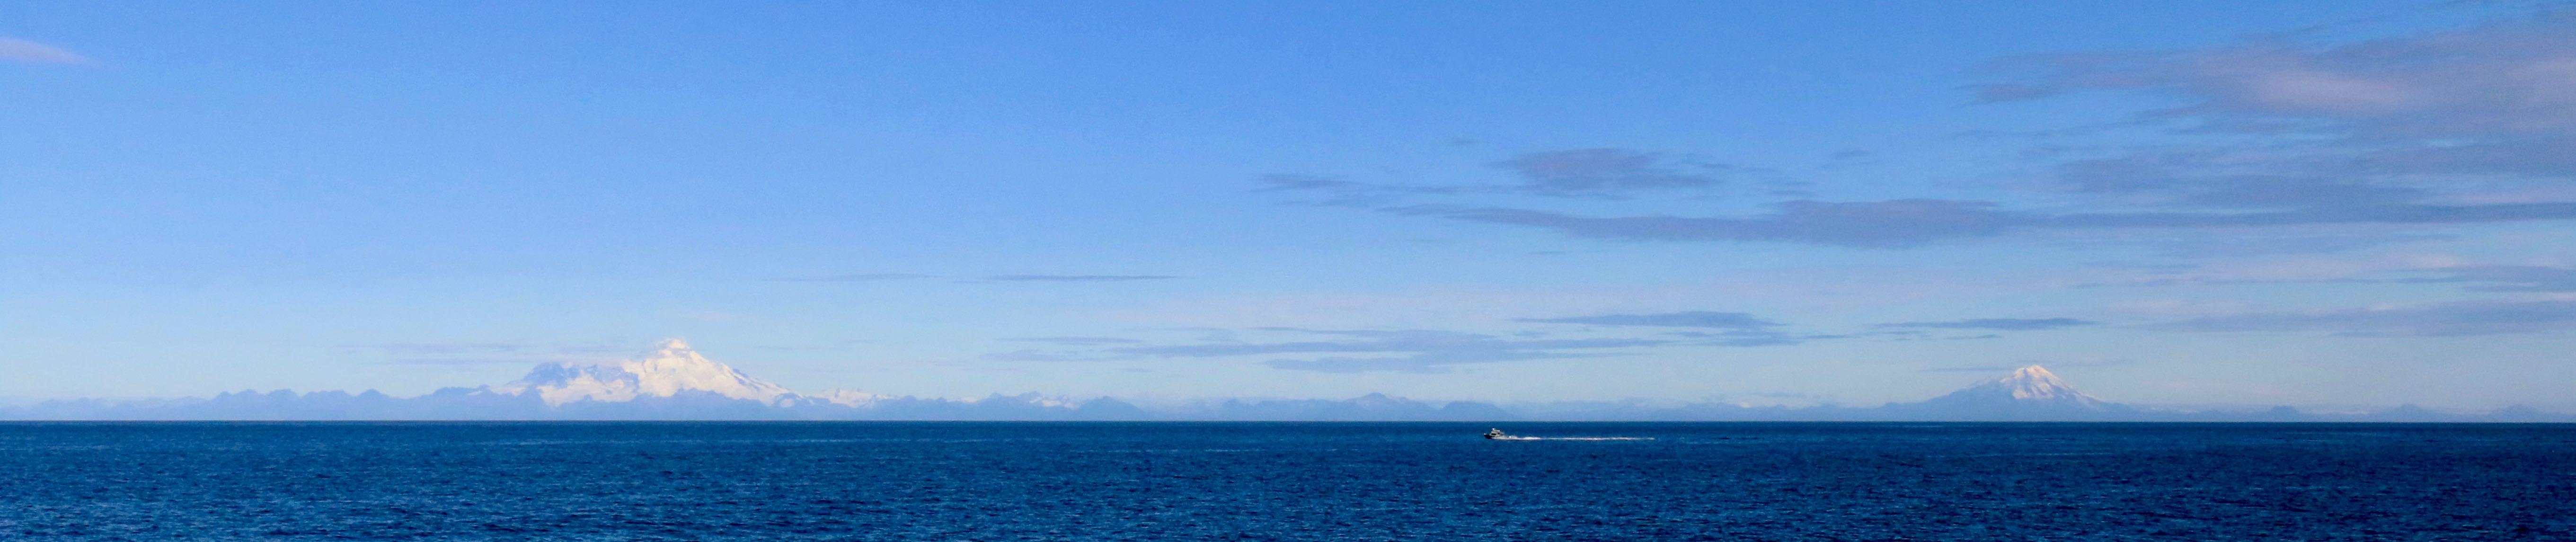 Aleutian Range volcanoes